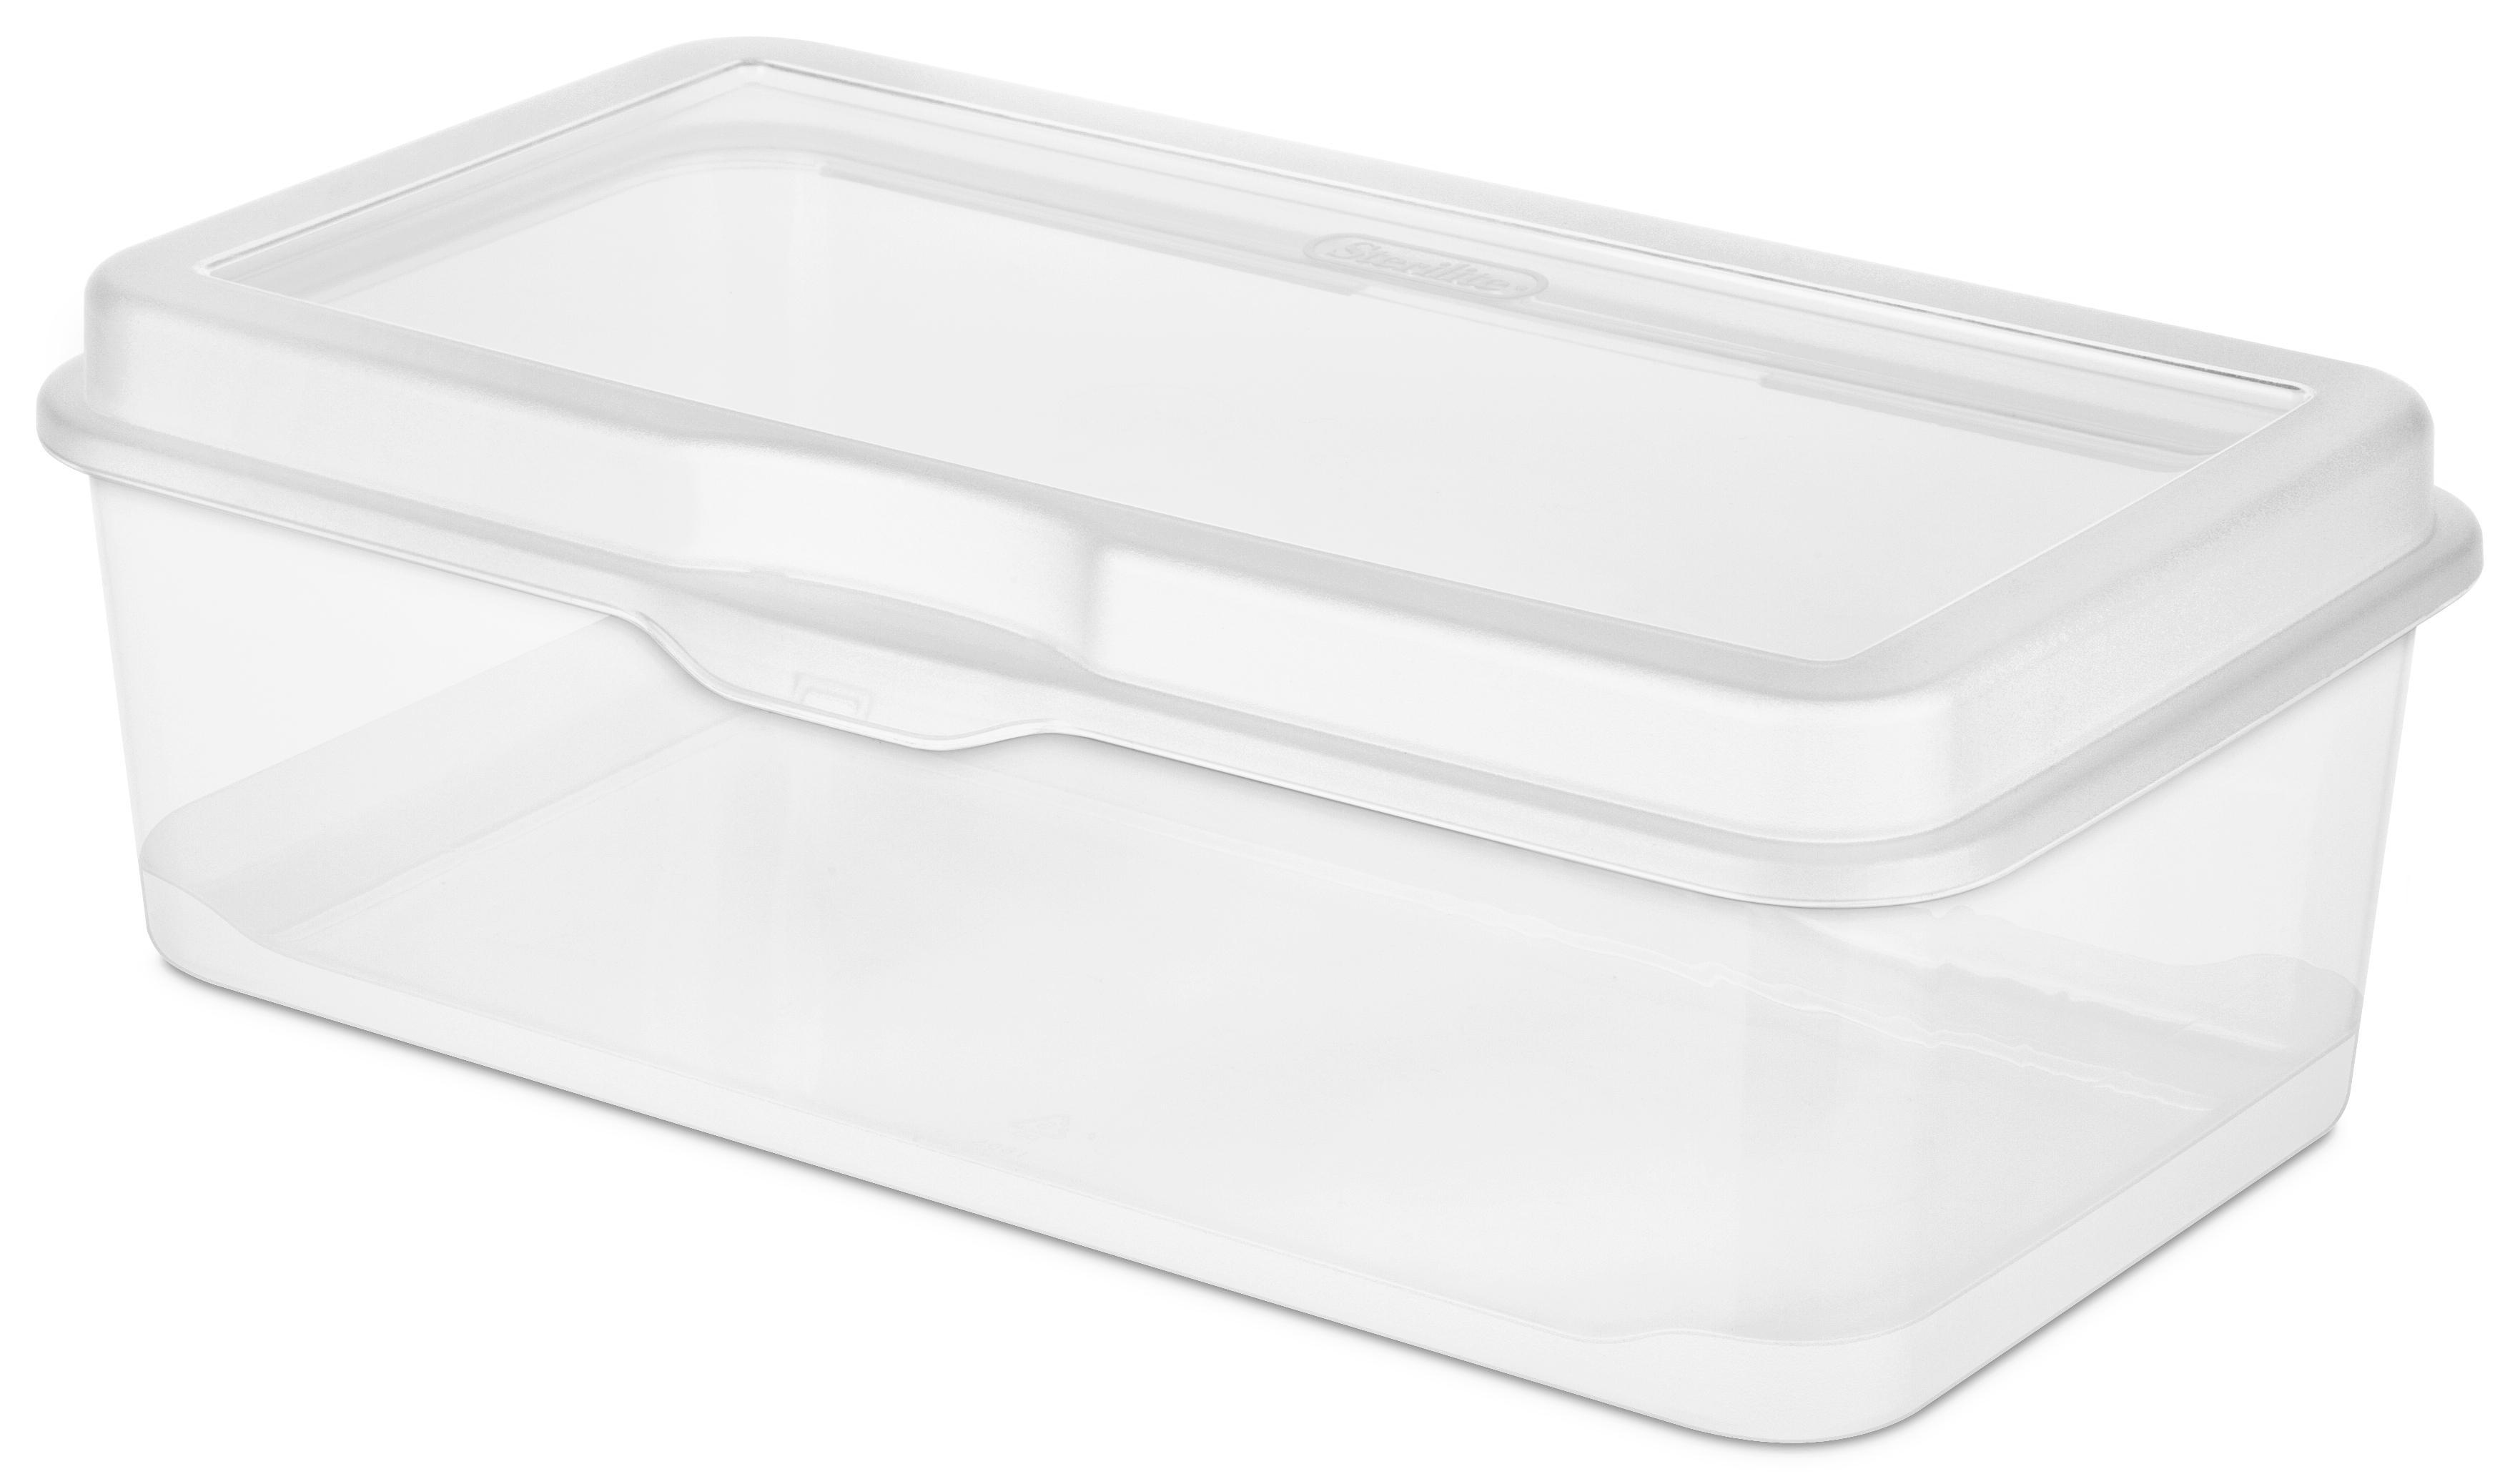 Sterilite Large Flip Top Storage Box